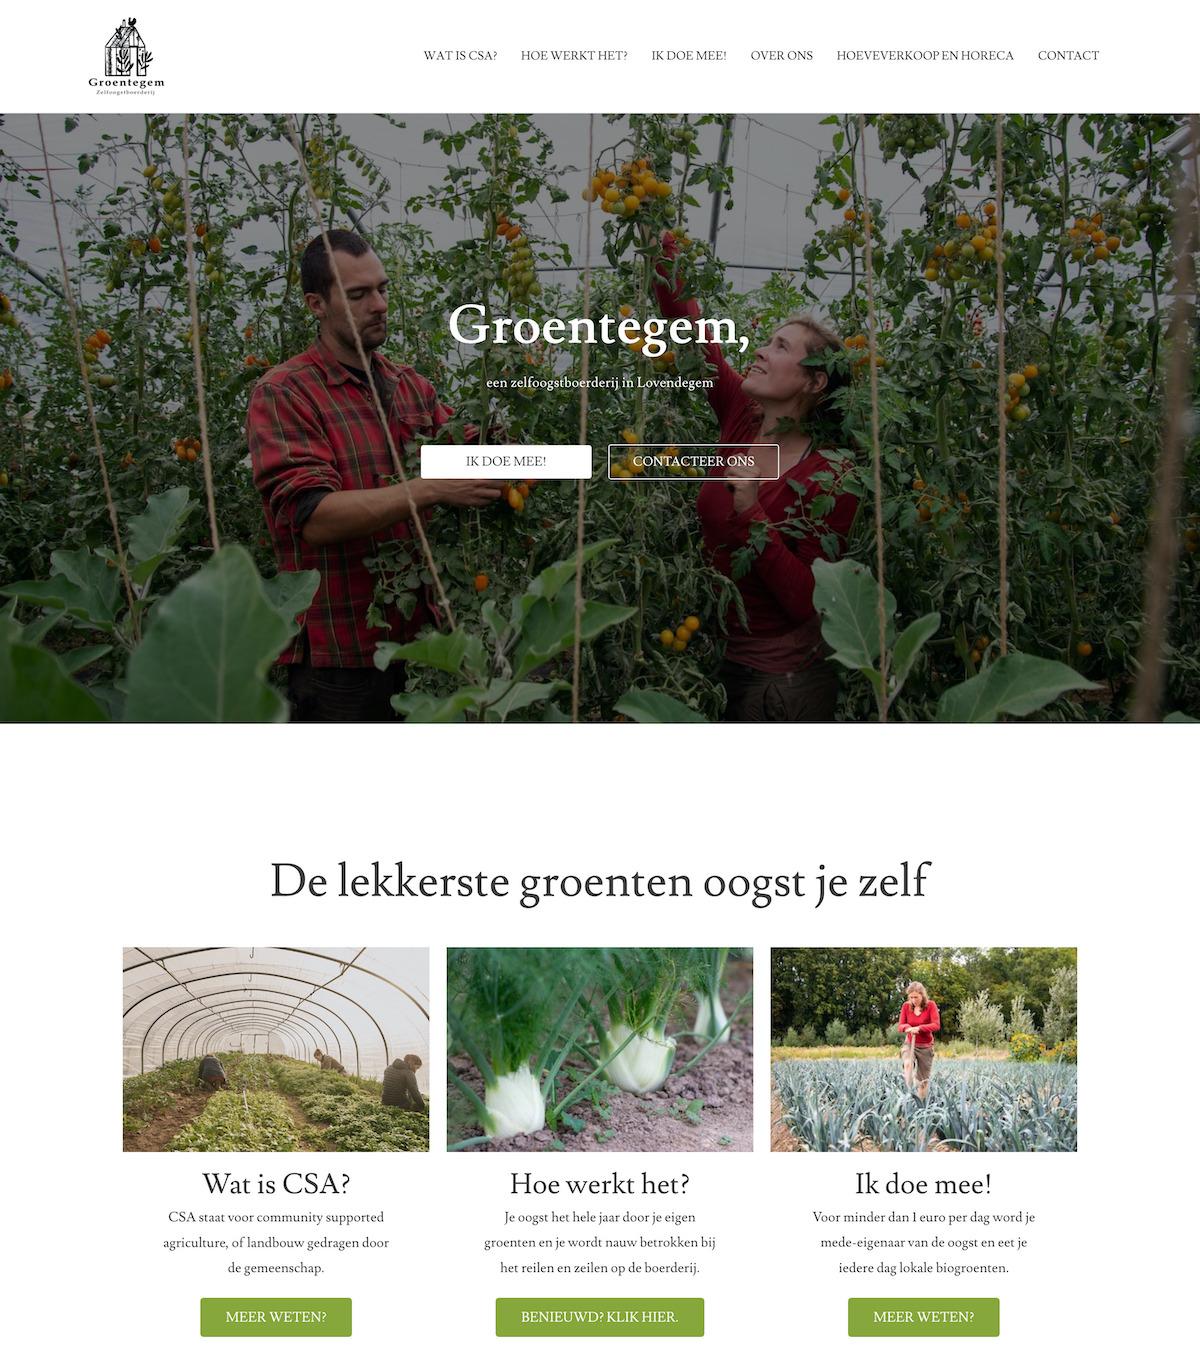 port-groentegem-1200